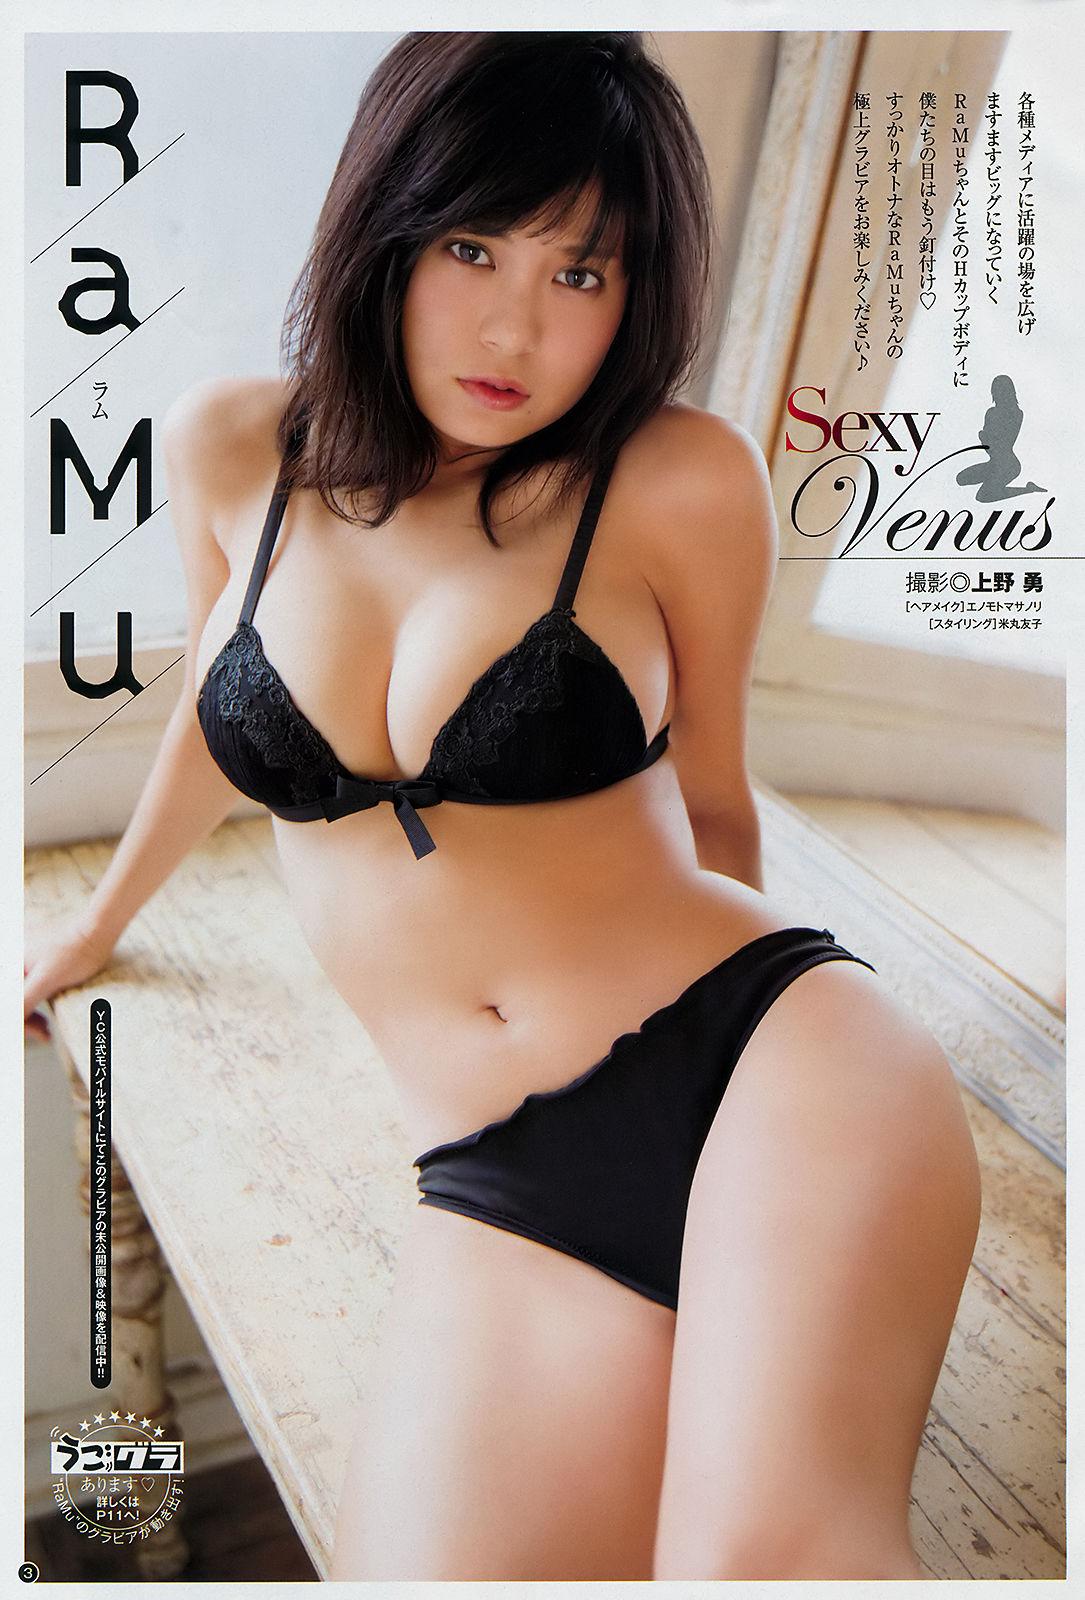 VOL.444 [Young Champion]日本少妇:RaMu超高清写真套图(14P)